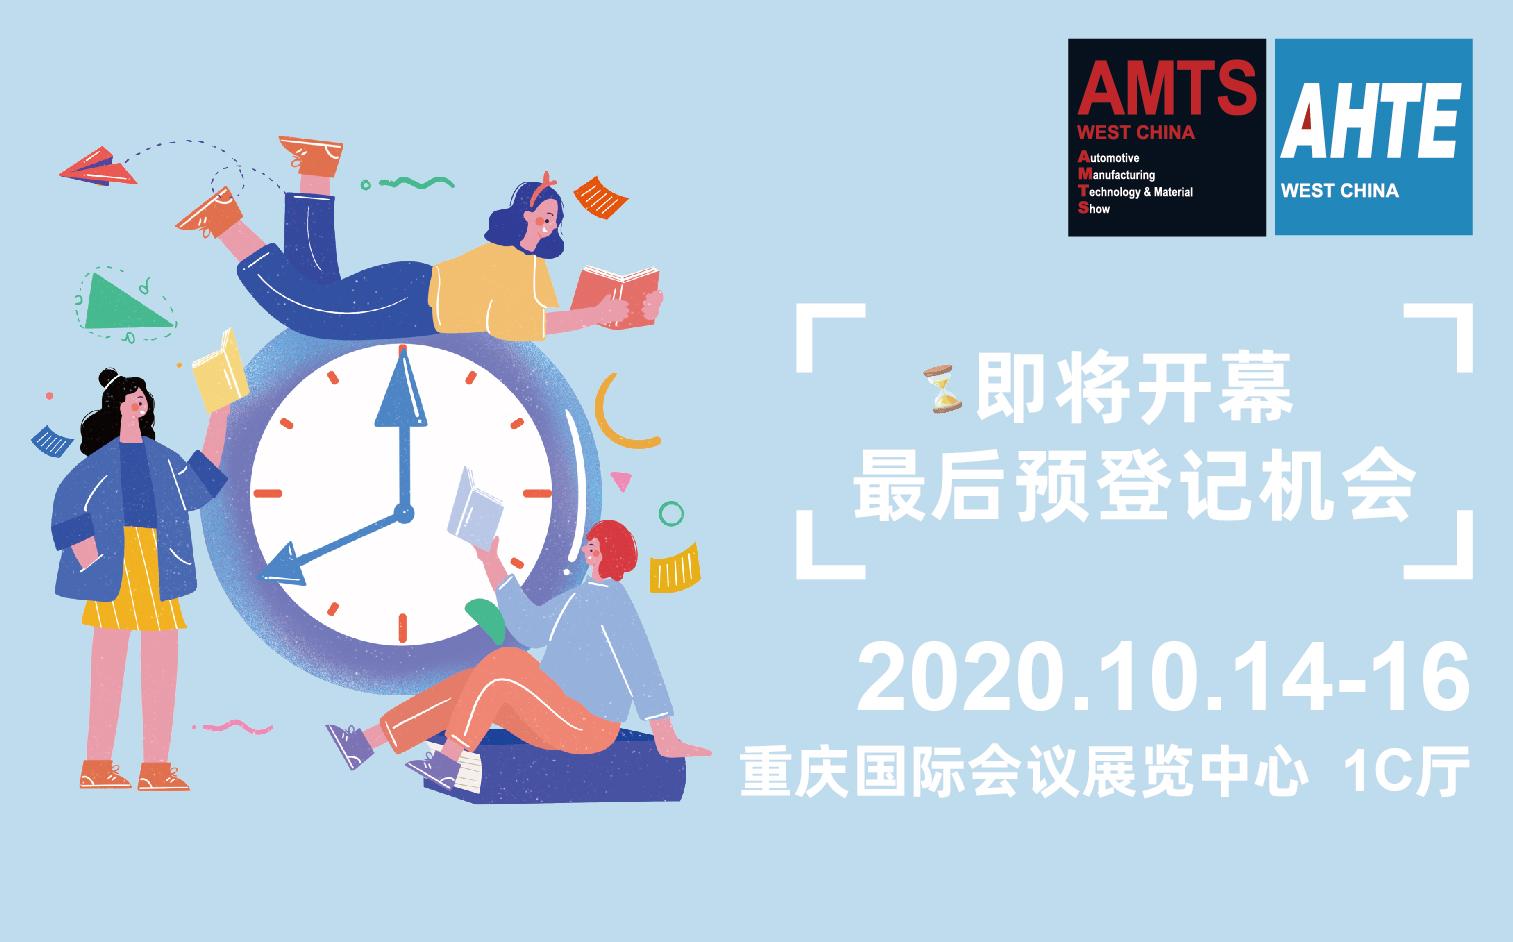 AMTS & AHTE 重庆站观展倒计时 | 即刻报名免费观展